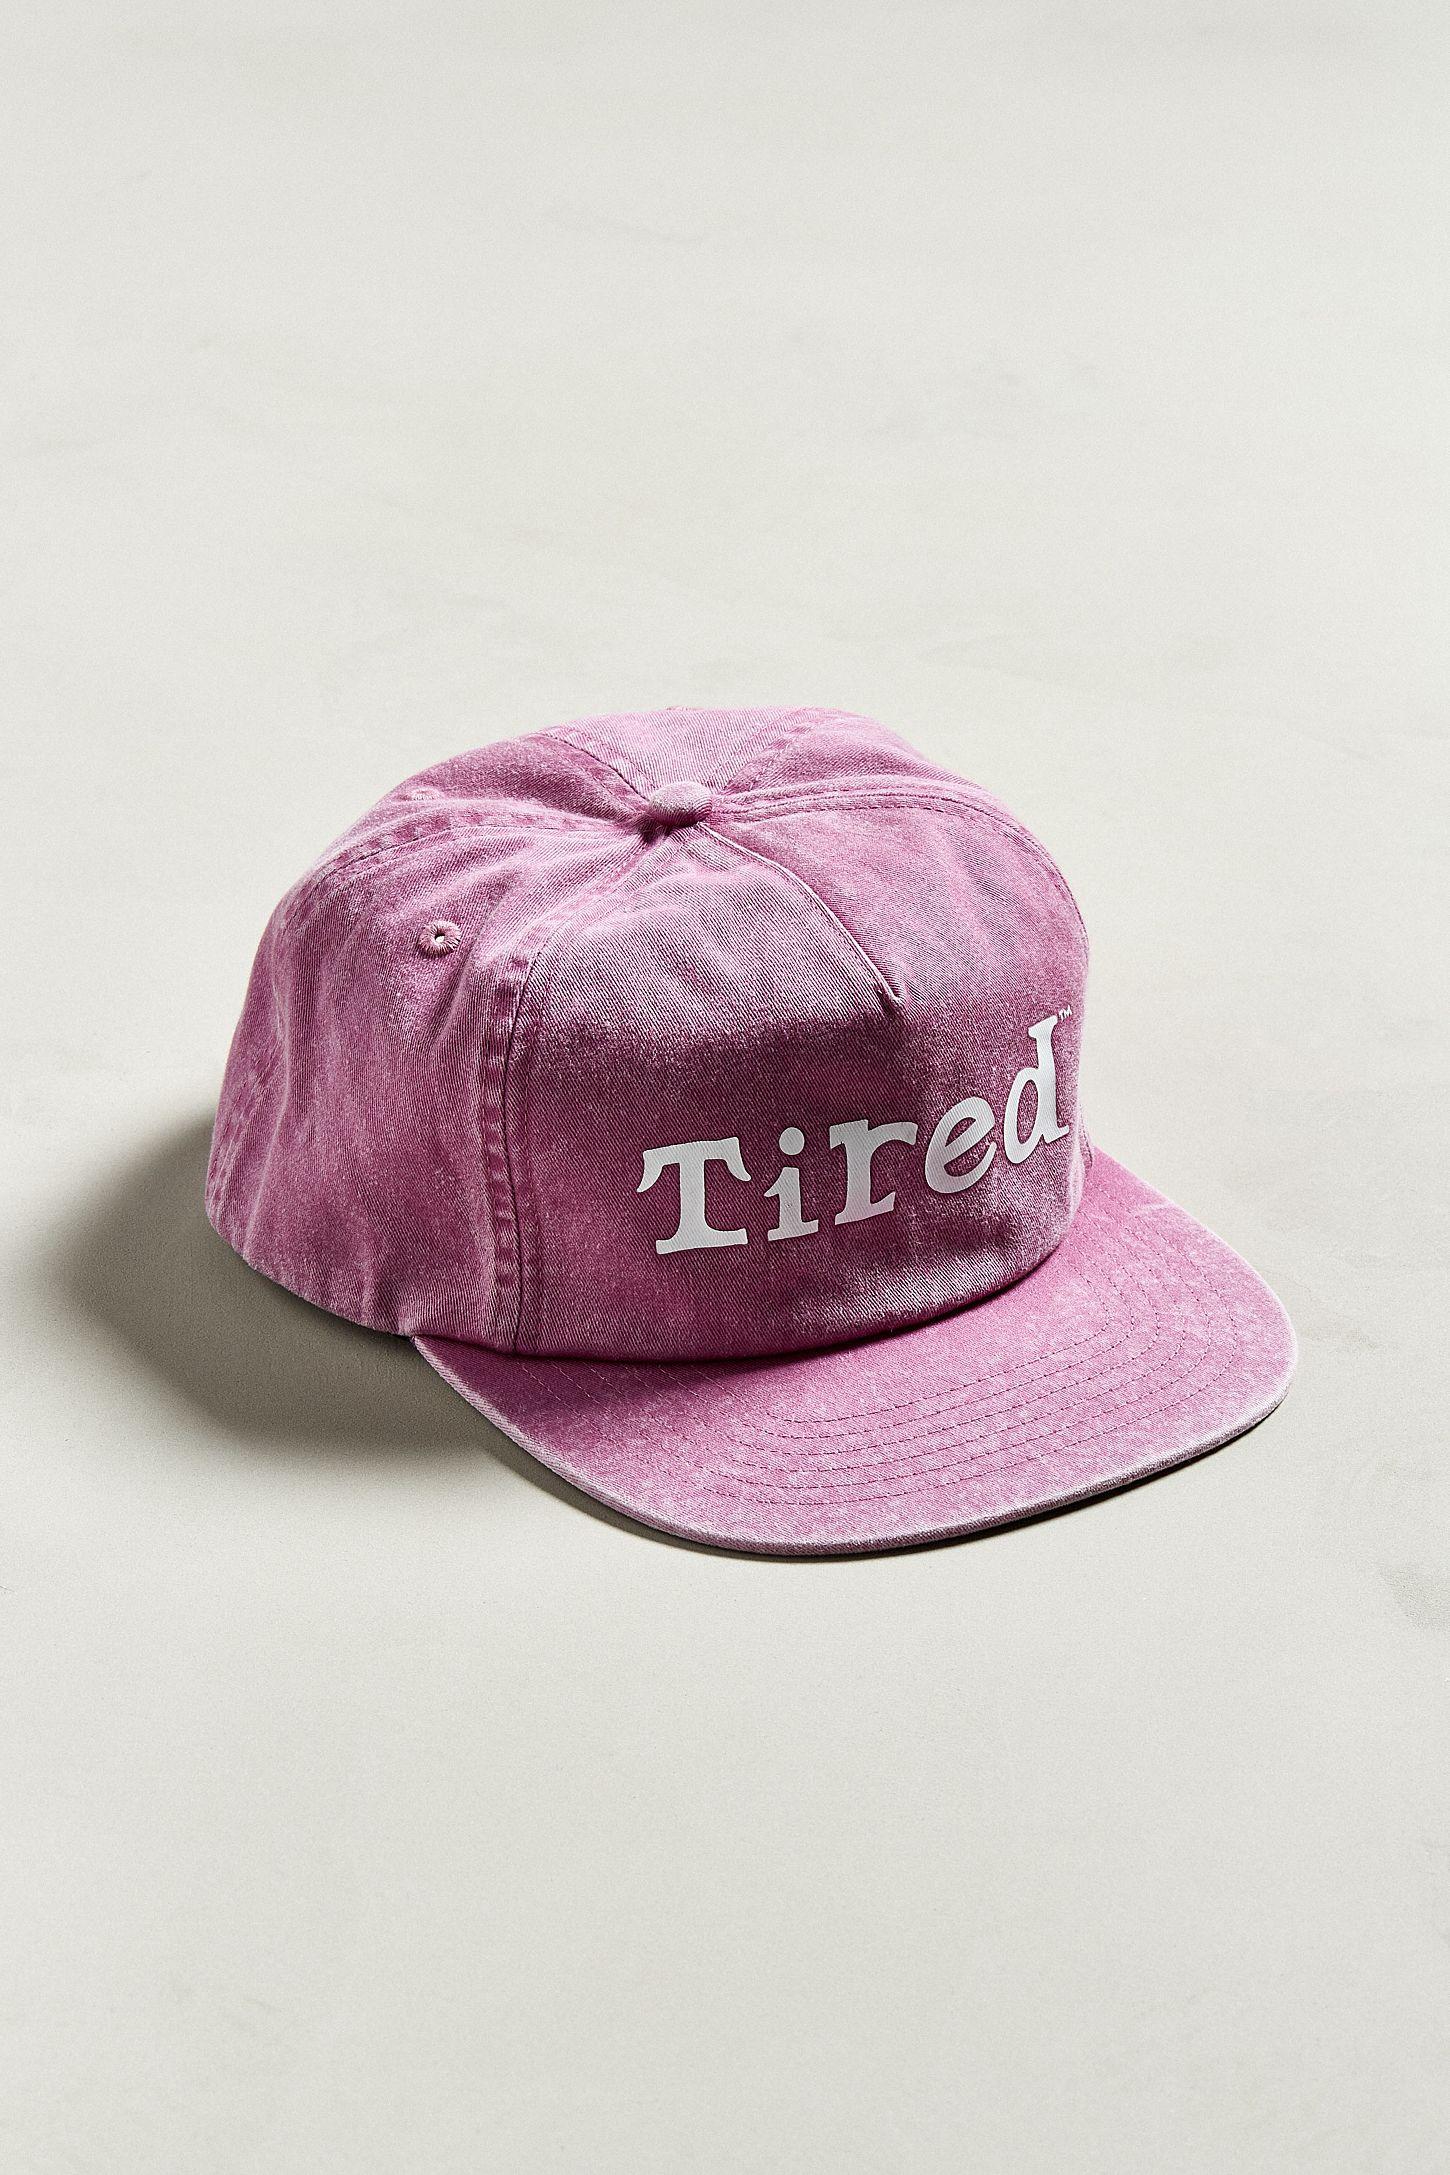 c6d274b3f1e1e Tired Washed Logo Snapback hat